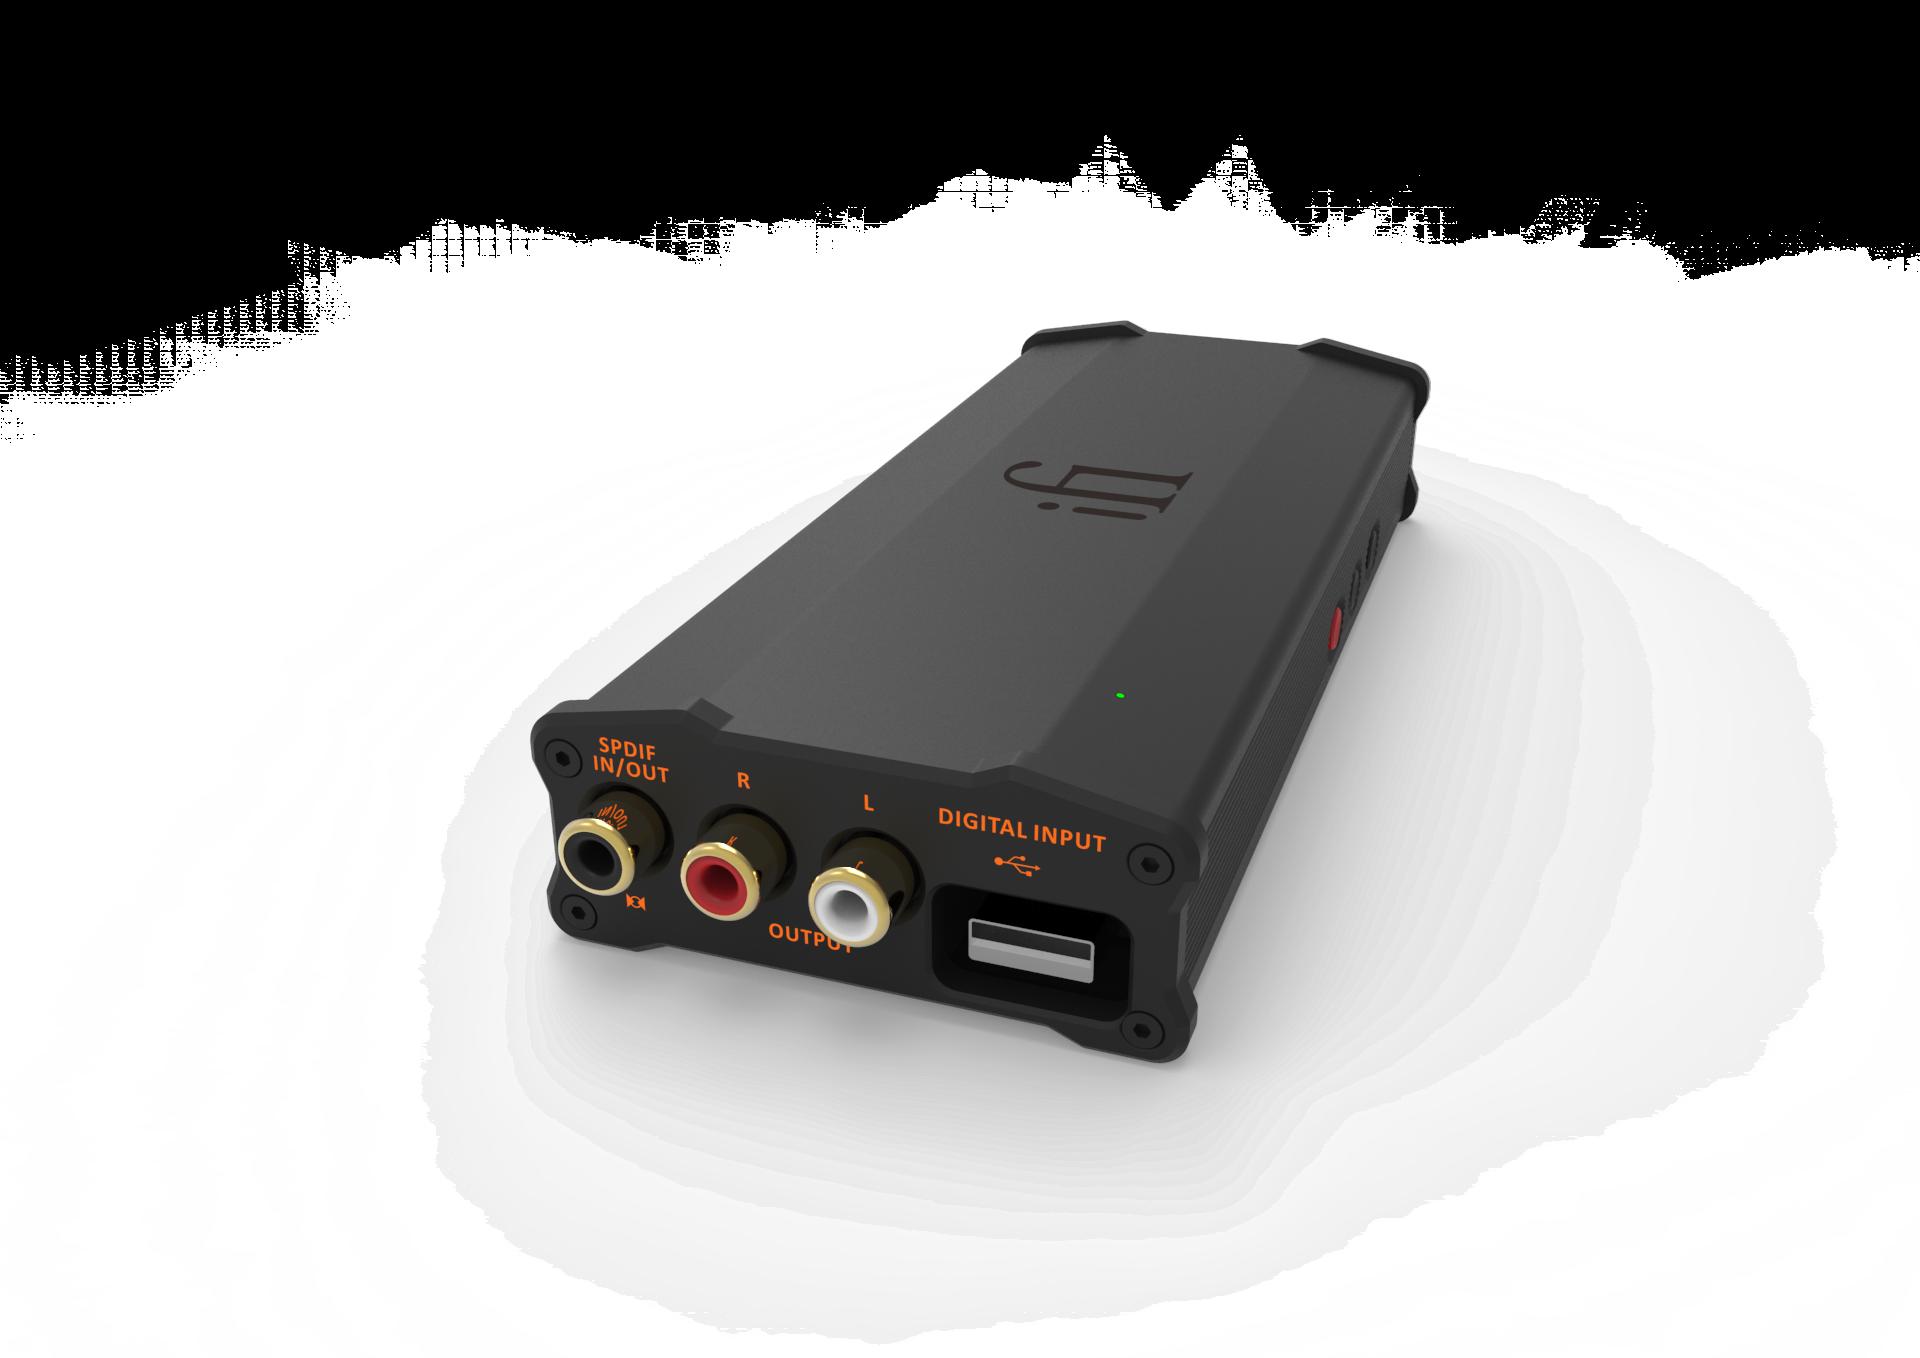 audiow3 dac amplificateur de casque ifi audio micro idsd black label. Black Bedroom Furniture Sets. Home Design Ideas